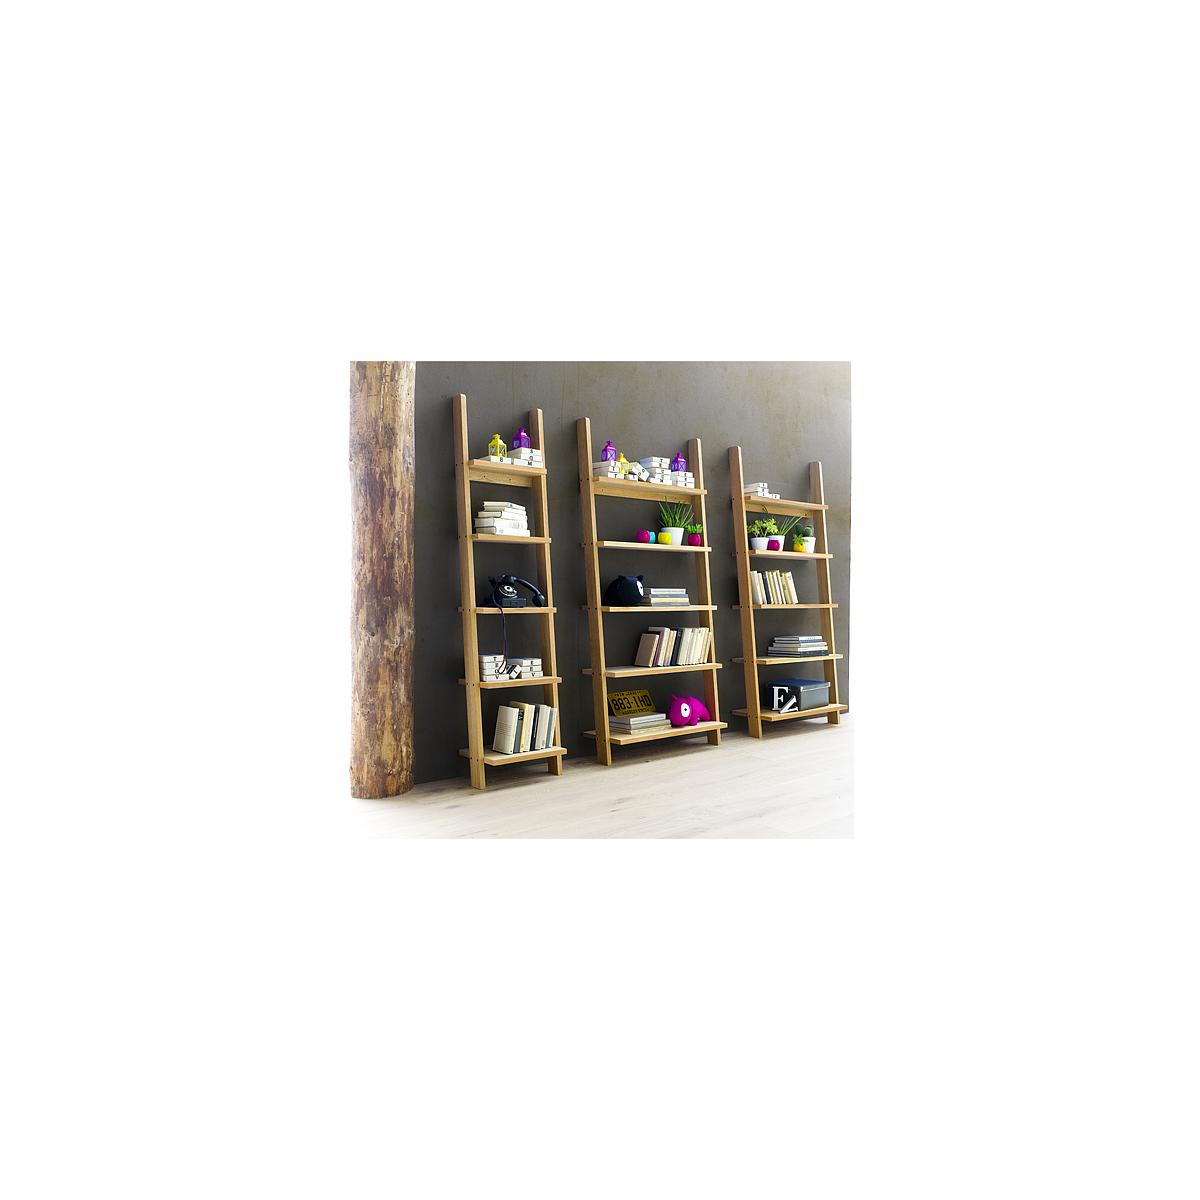 STRADA by Tenzo Bibliothèque Echelle étroite - Gris